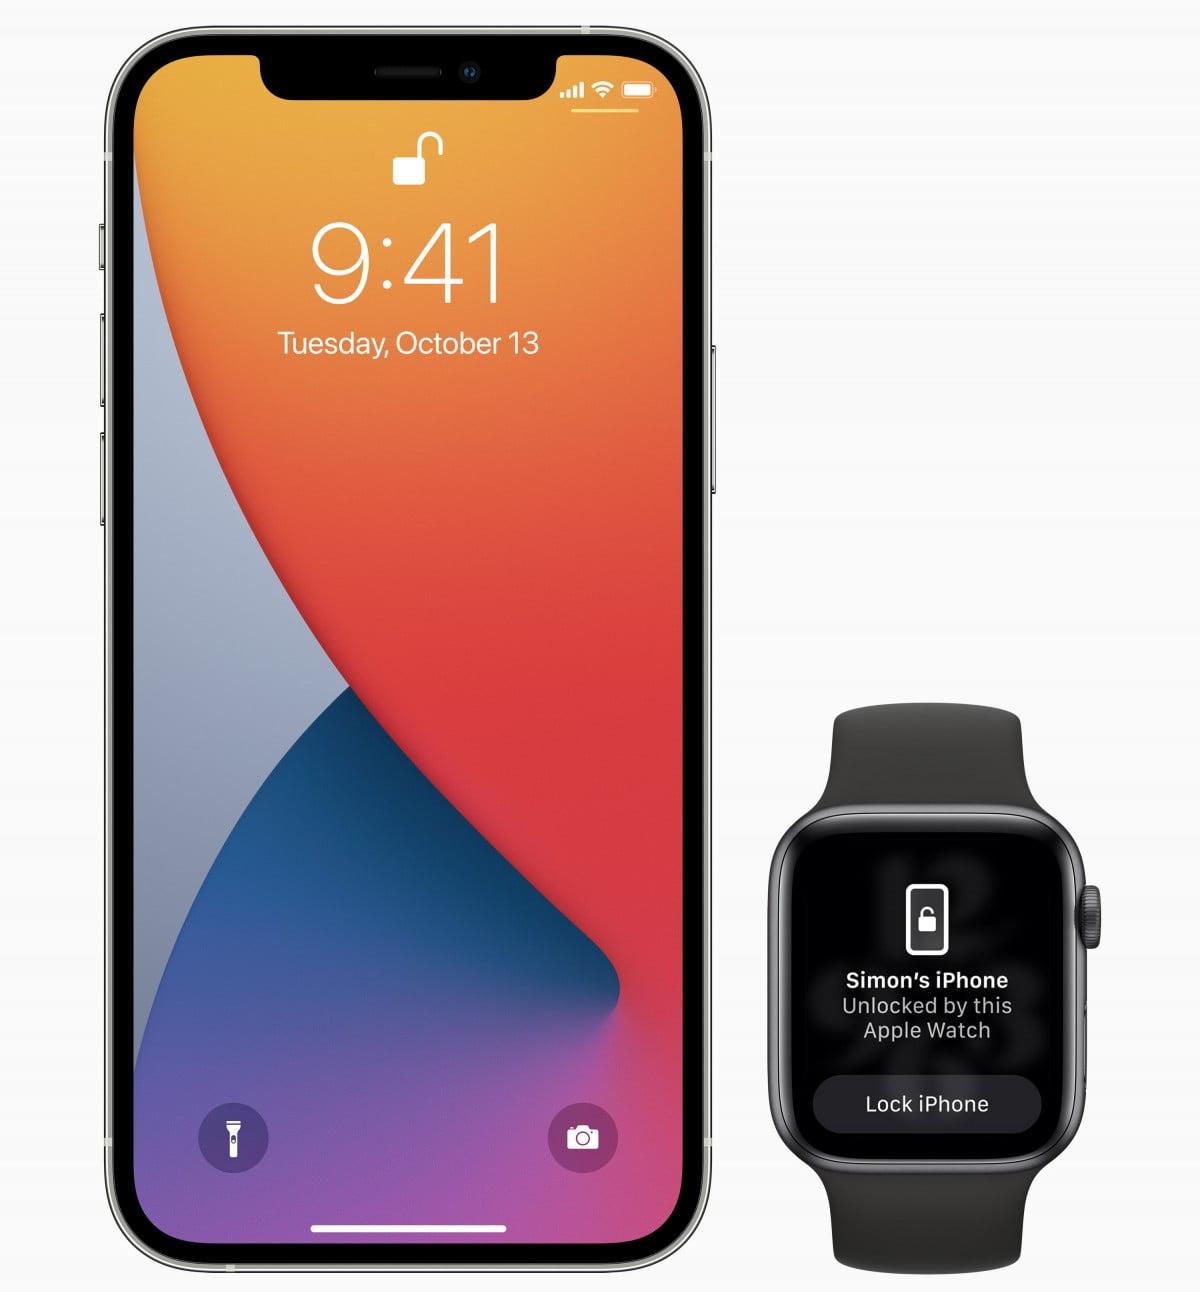 Apple iOS 14-5 watch Unlock